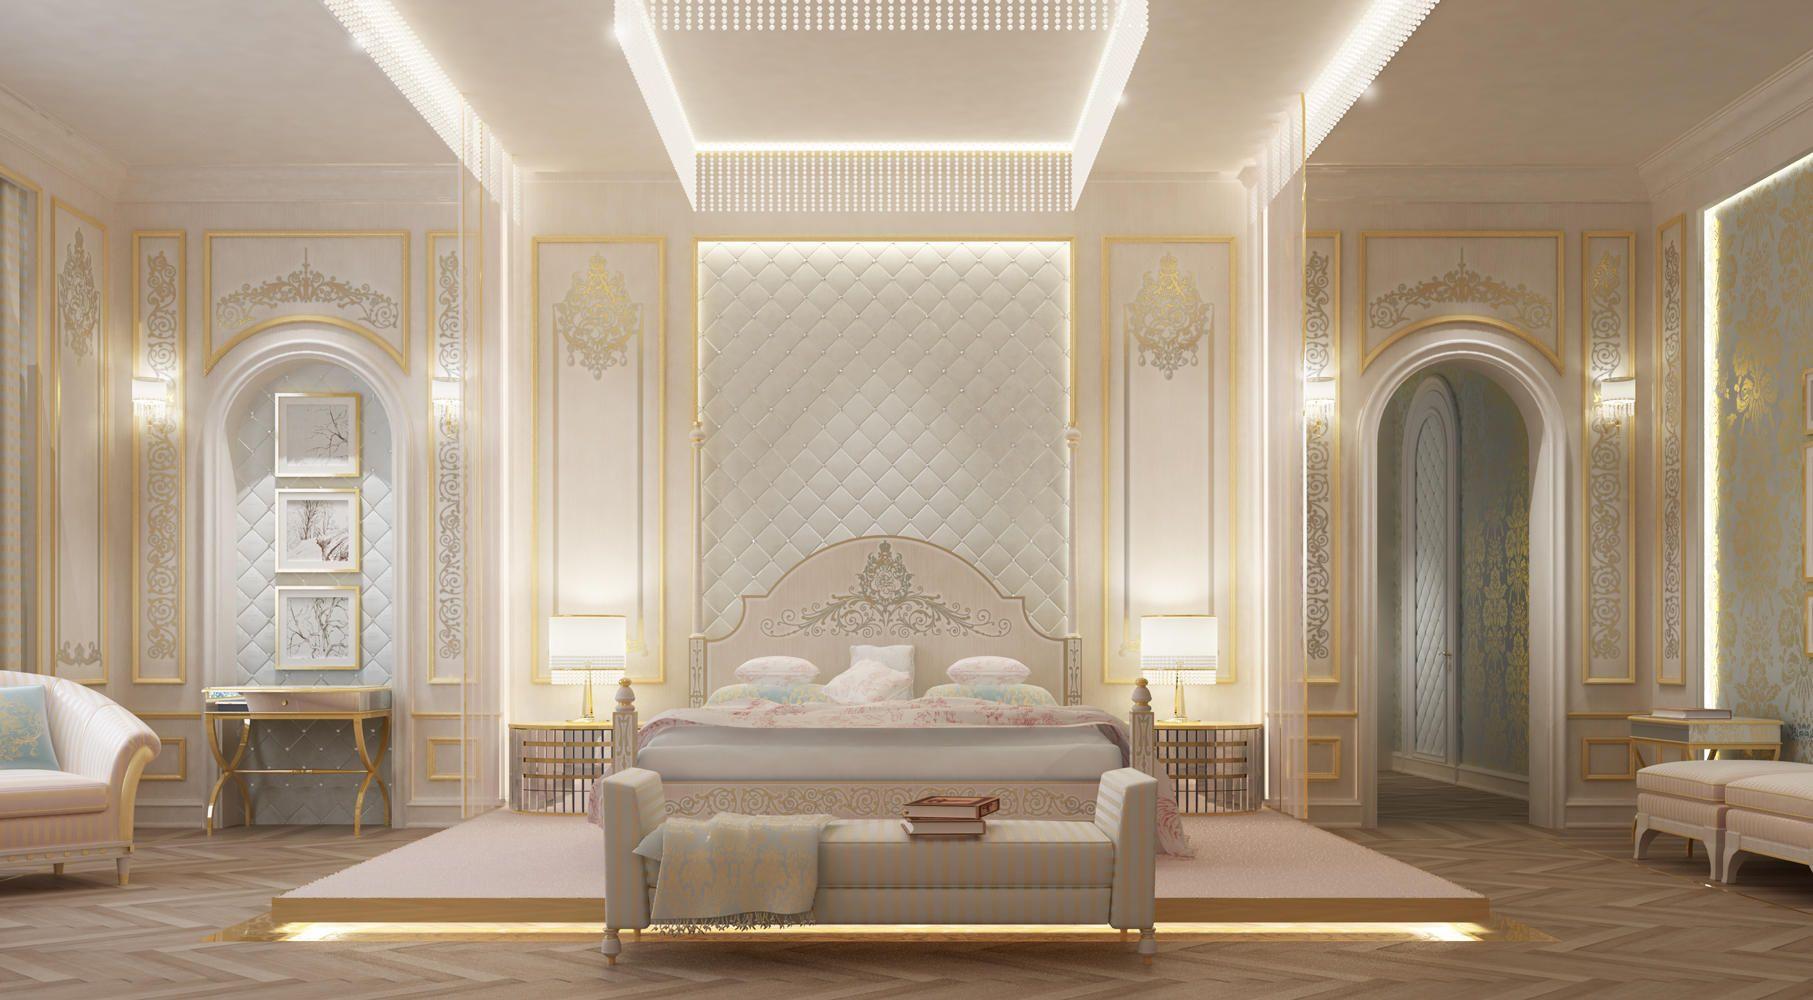 Arab Palaces Buscar Con Google Classical Interior